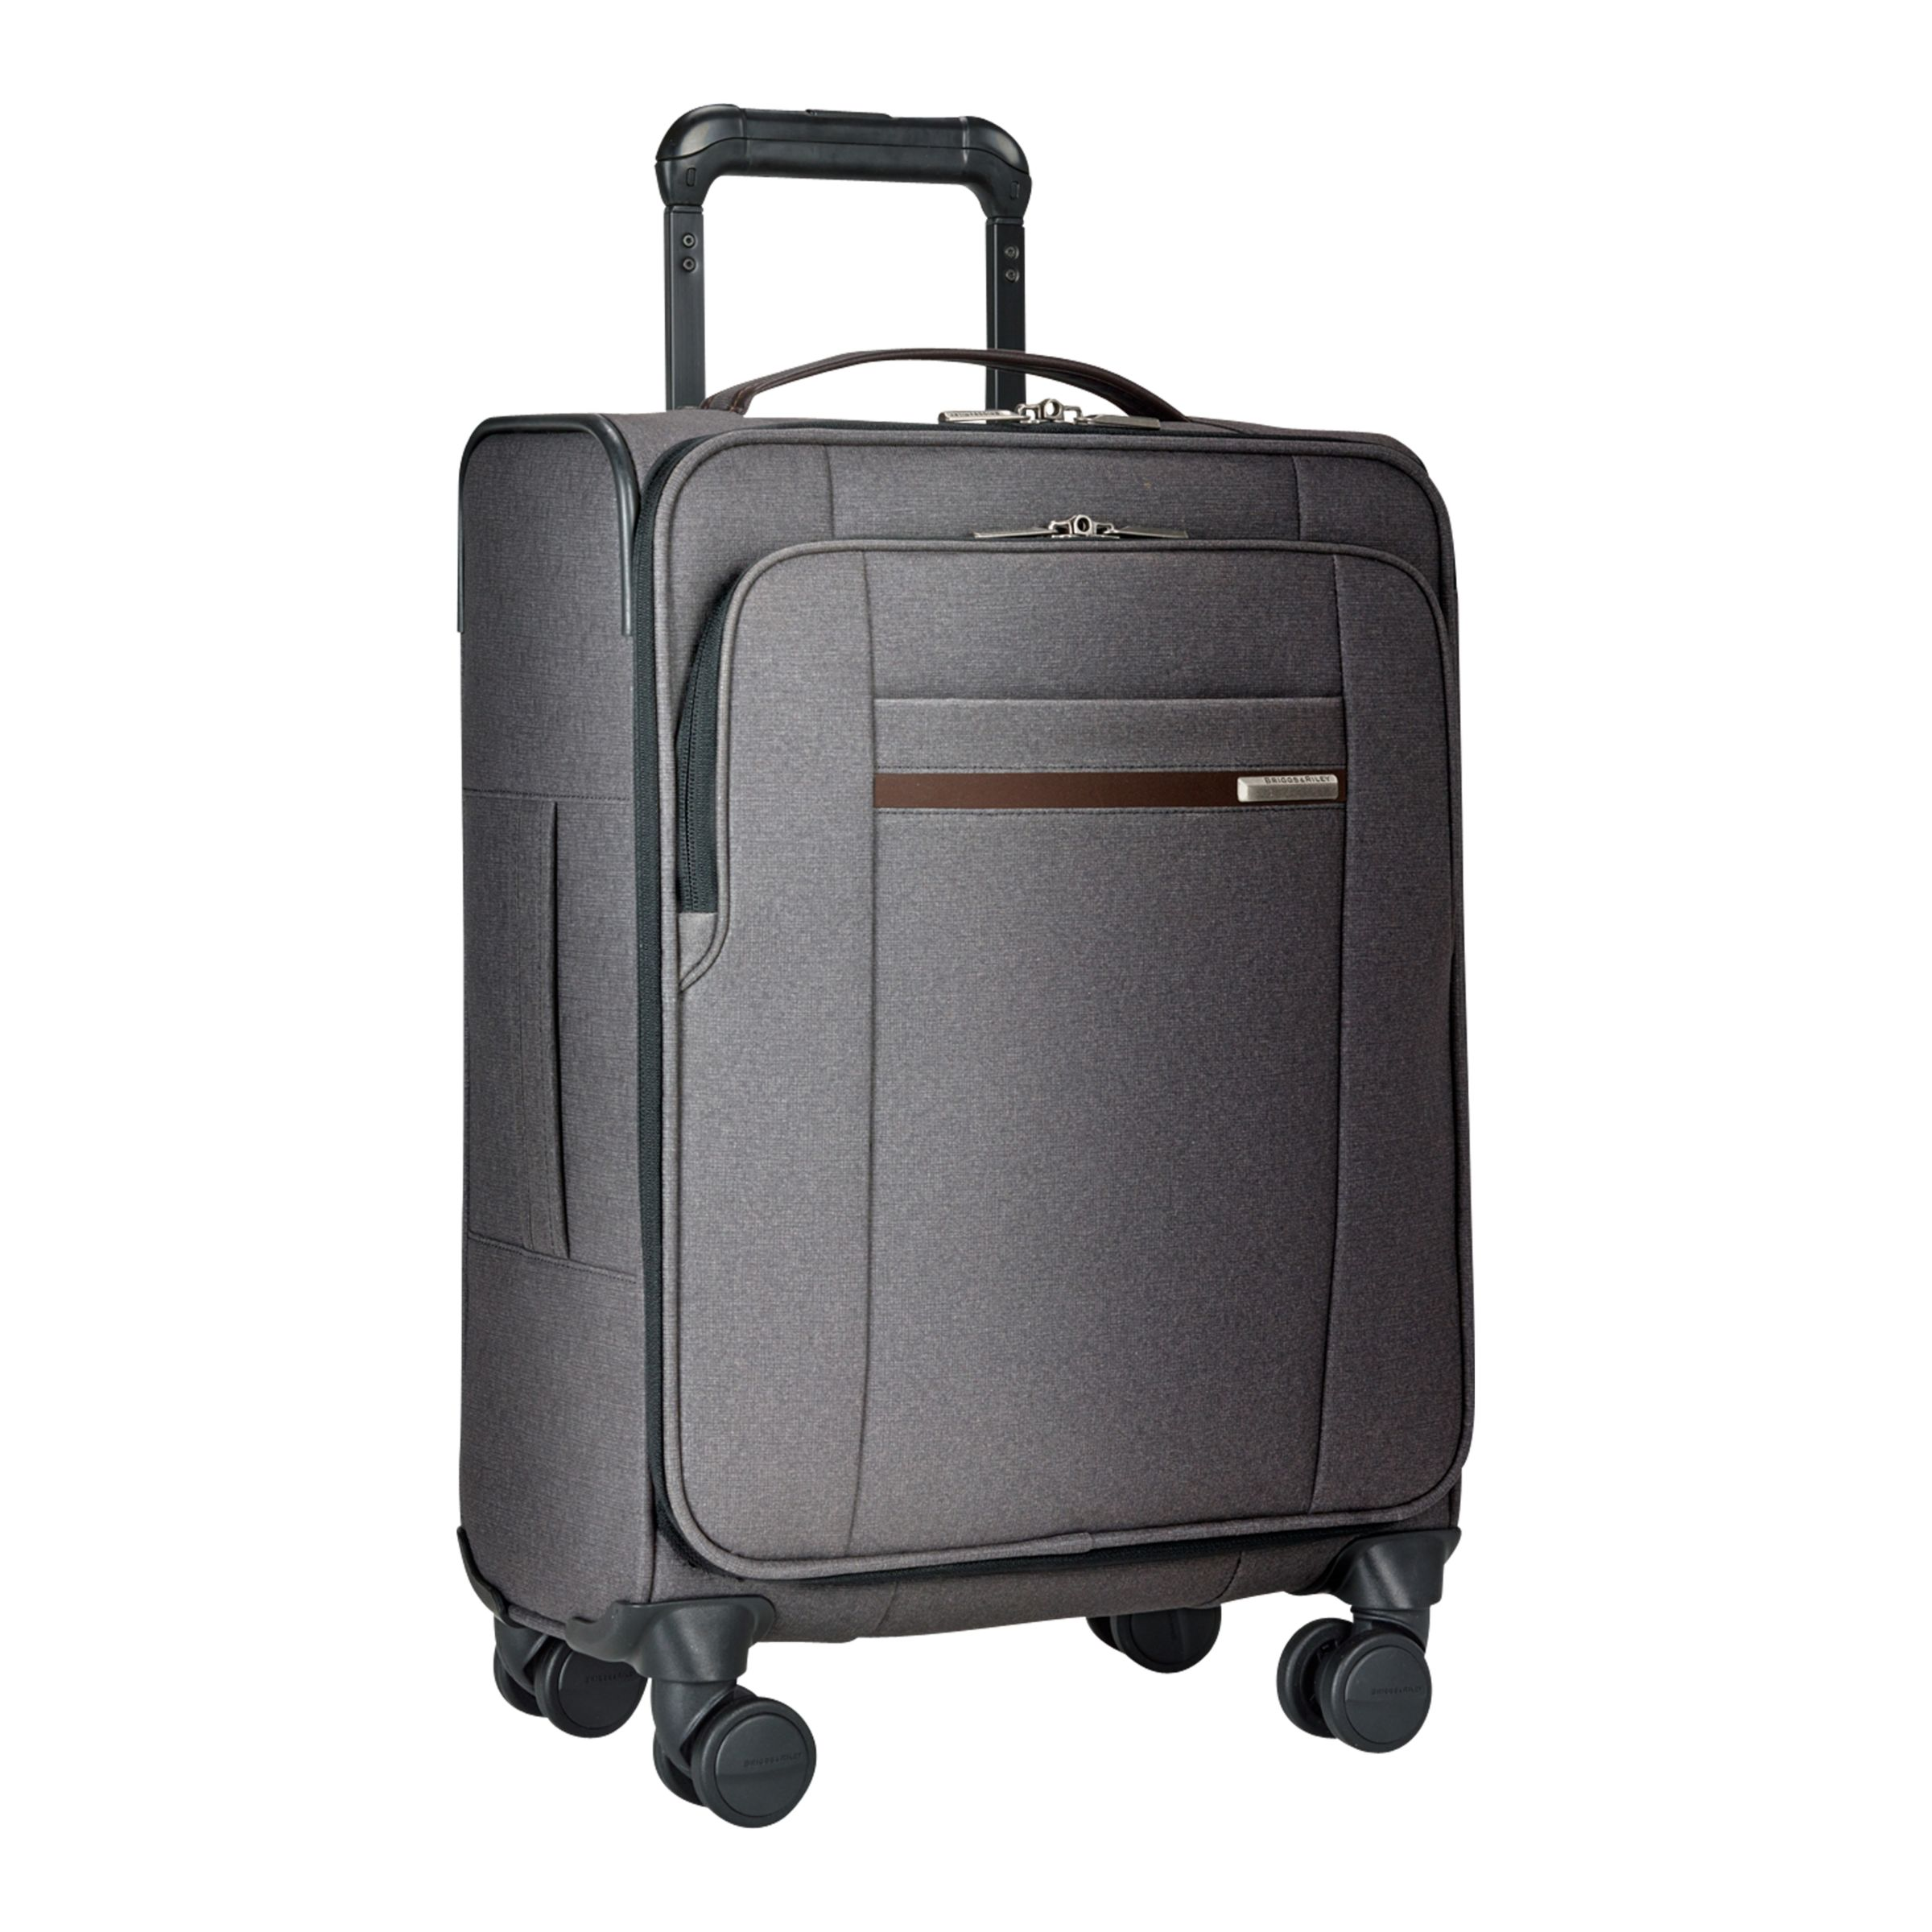 Briggs & Riley Briggs & Riley Kinzie Cabin International Carry On Spinner Suitcase